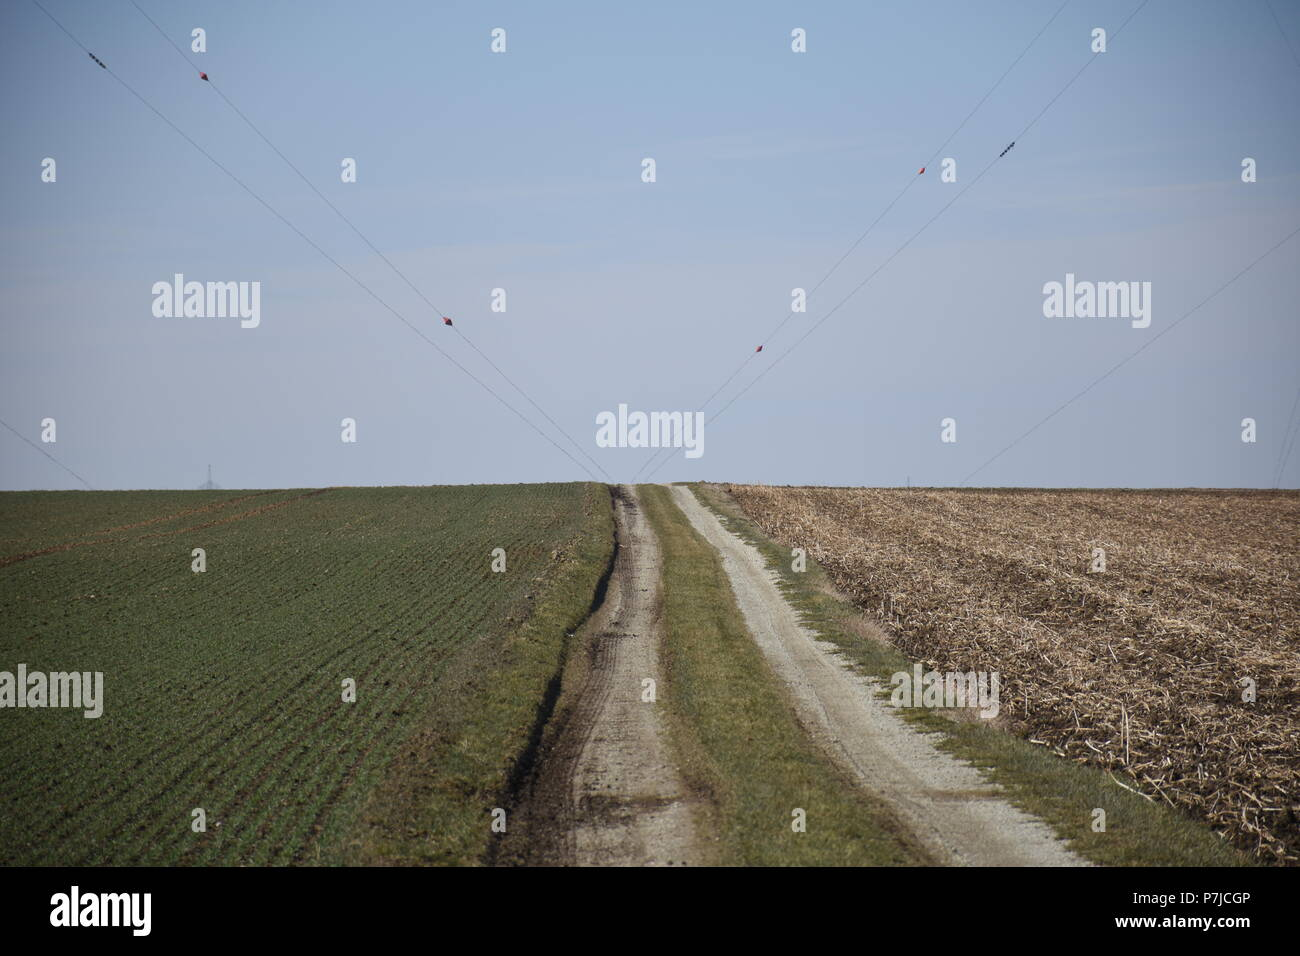 Aholming, Felder, Feld, Acker, gepflügt, umgepflügt, Scholle, Erde, Frühjahr, Frühling, Bayern, Niederbayern, Deutschland, Feldweg, Rain, Landwirtscha - Stock Image